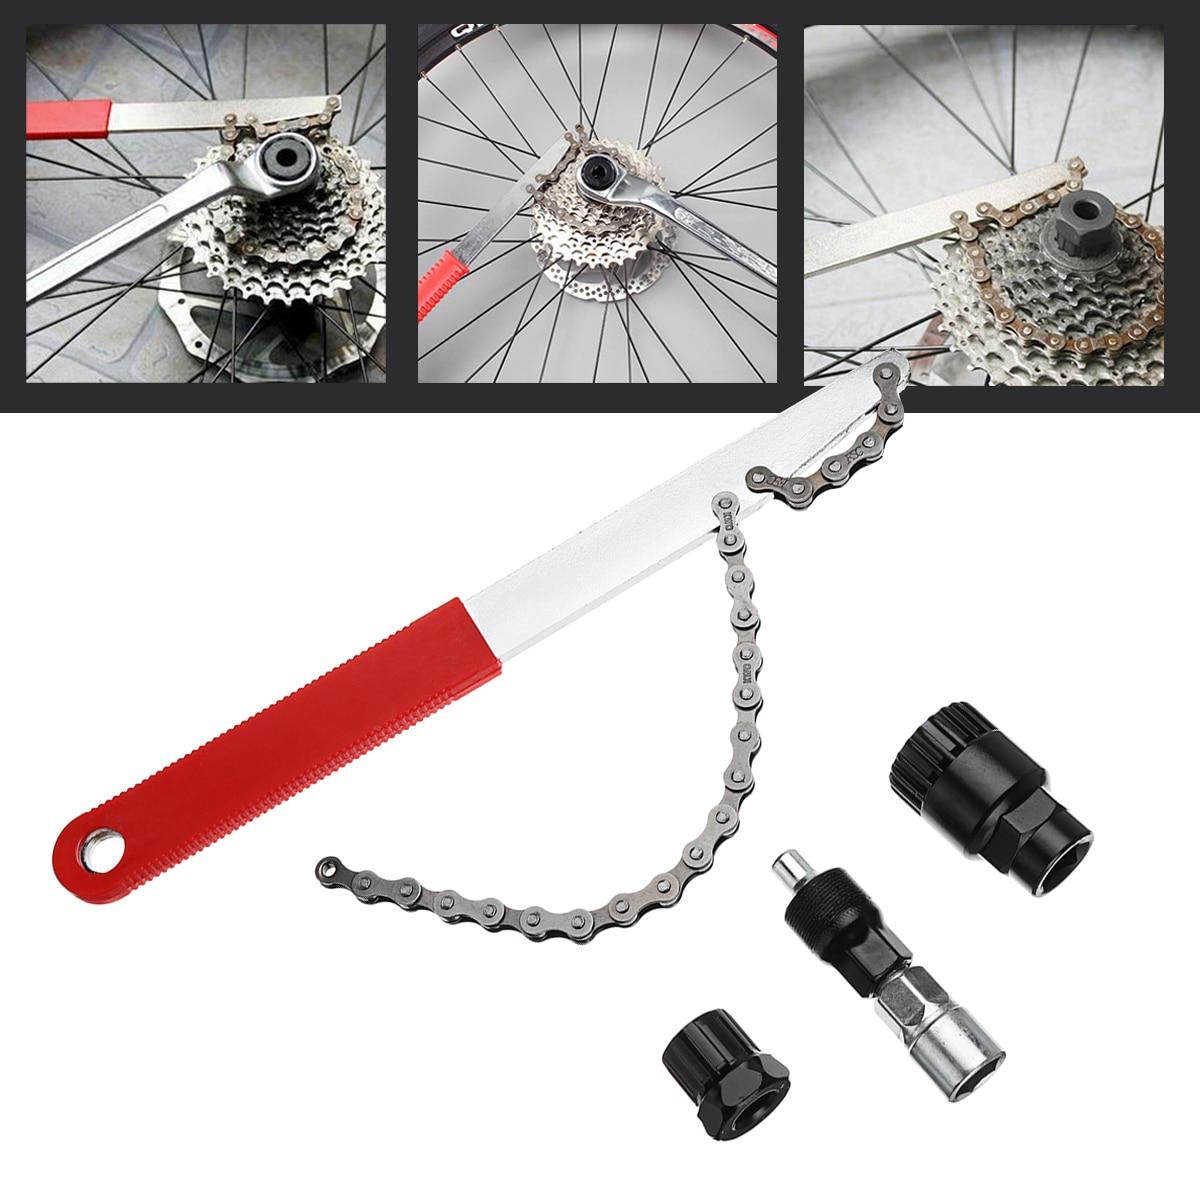 Lockring Tool Bike Freewheel Wrench Chain Whip Cassette Sprocket Remover